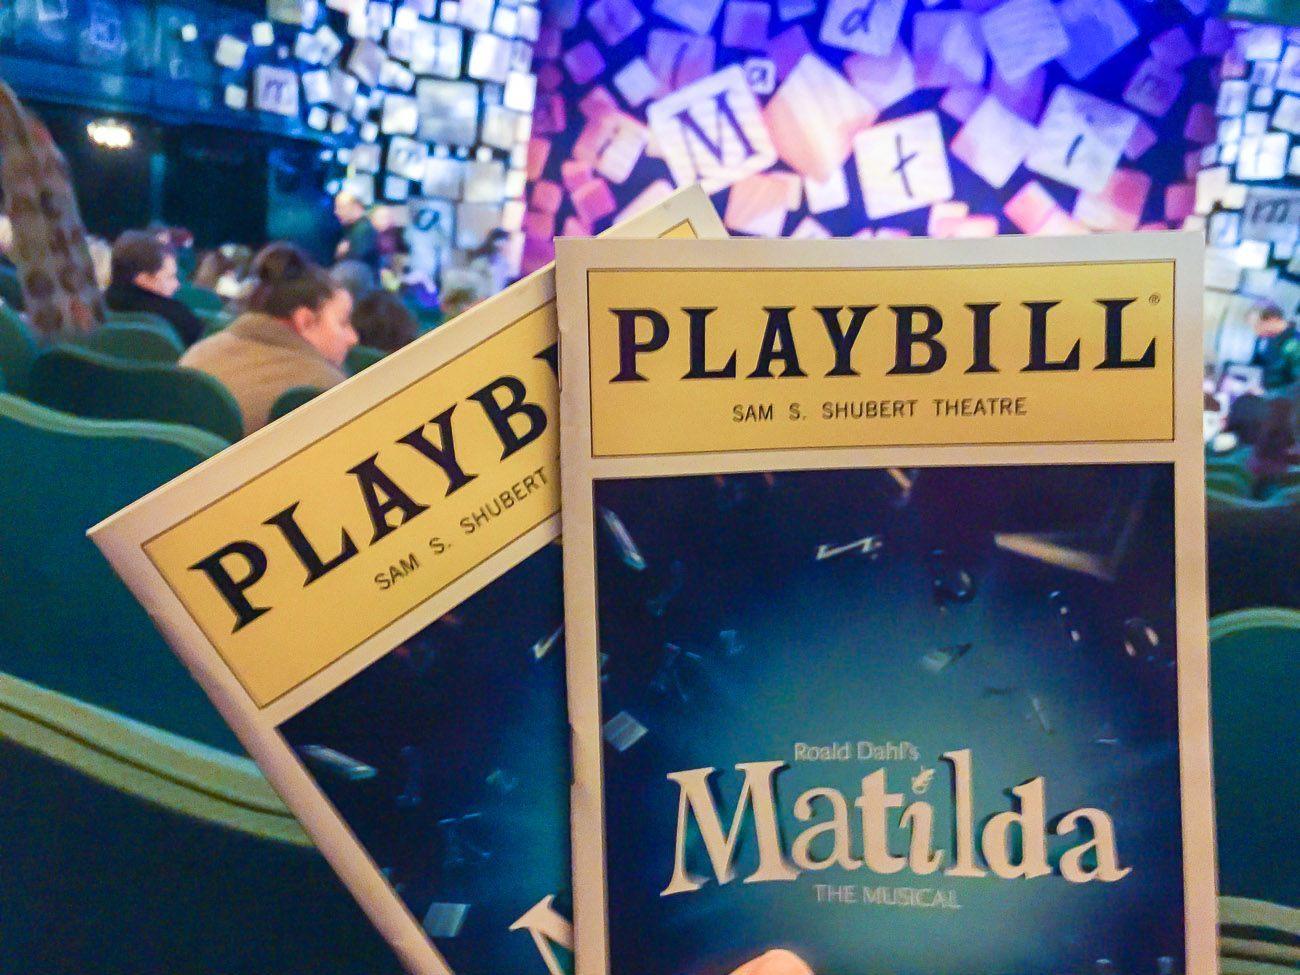 Matilda the Musical orchestra seats